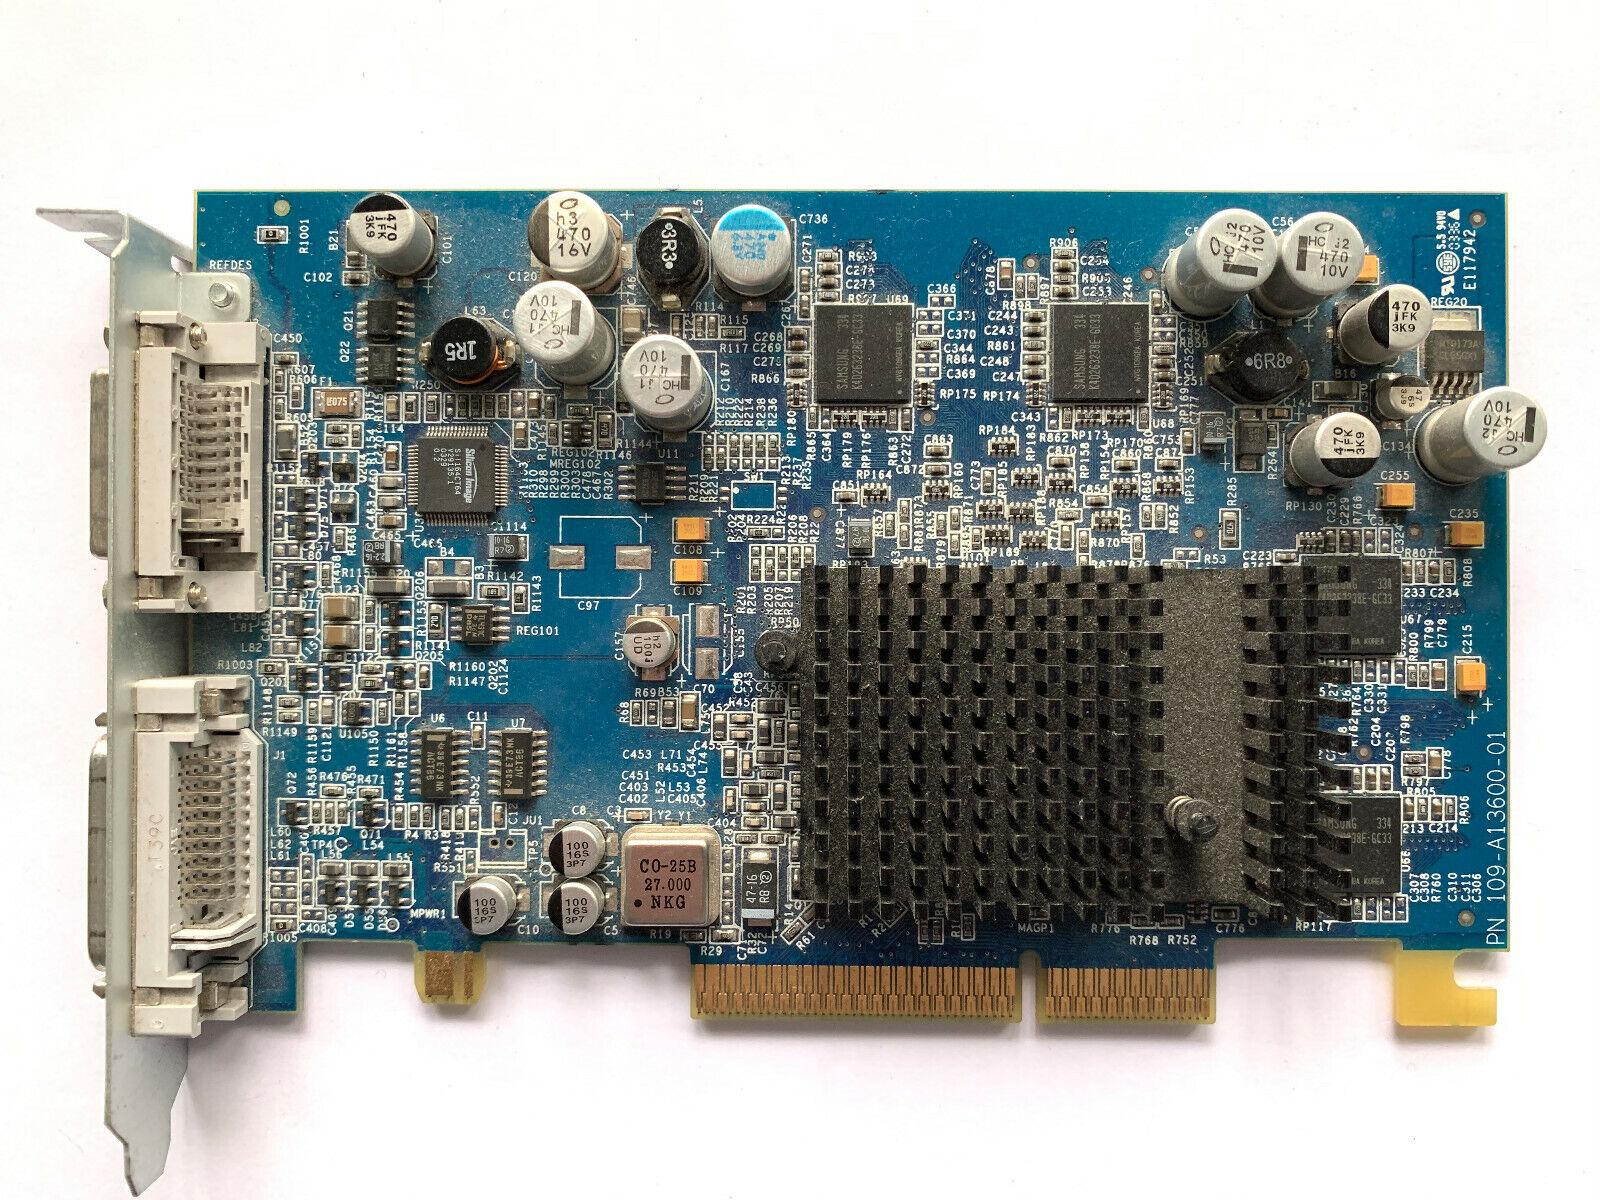 Apple PowerMac G5 ATI Radion 9600 Pro 64MB Video Graphics Card DVI ADC 603-3252